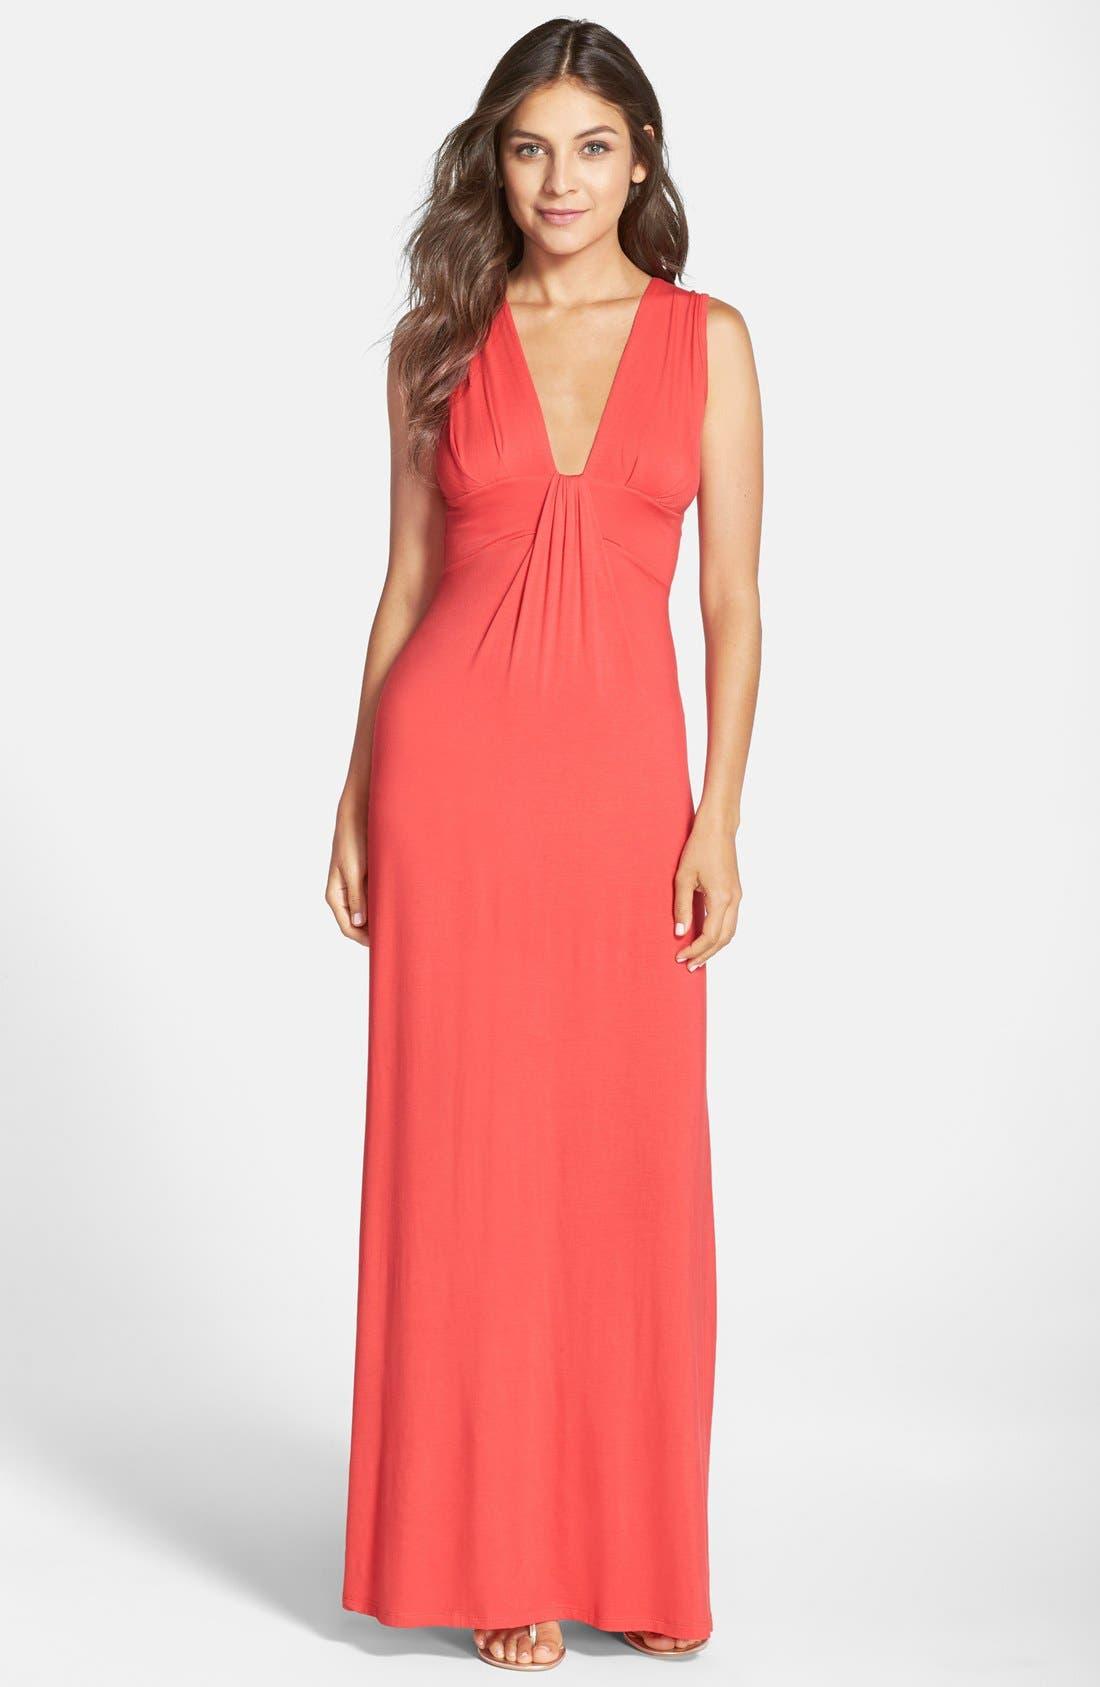 Olian maxi dress